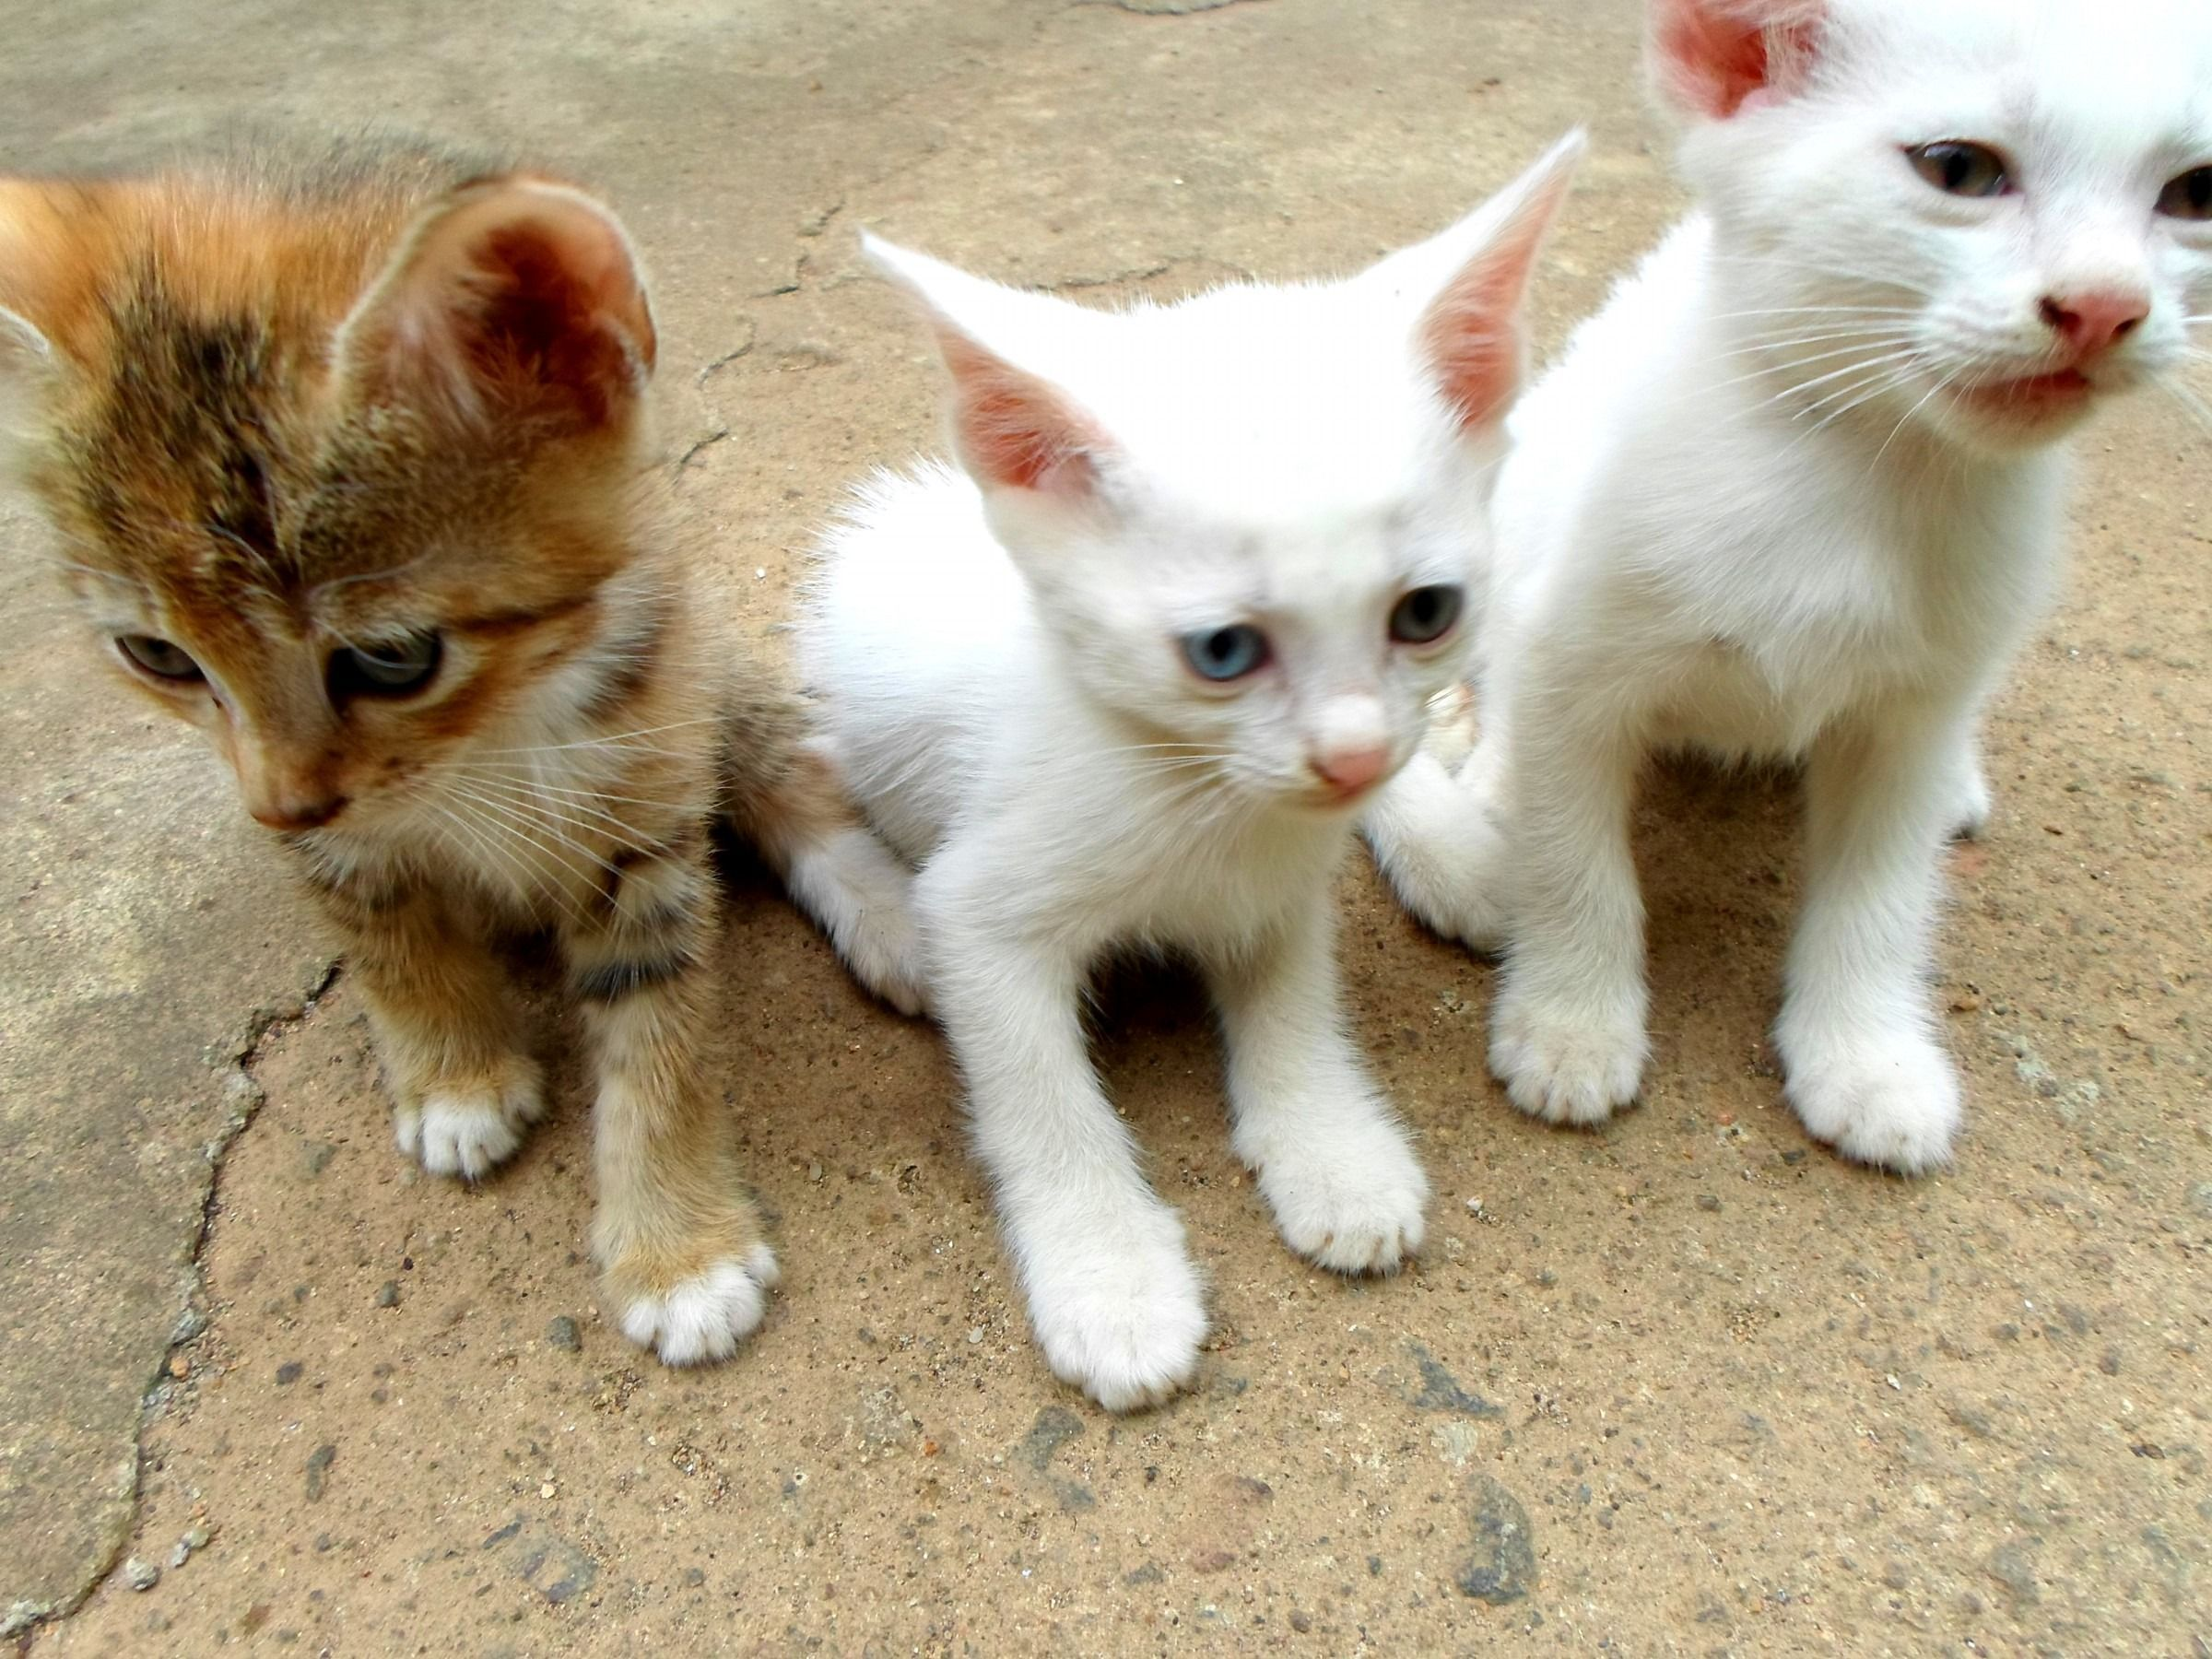 Cute Puppies With Cute Kittens Cute Unicorn Kittens Cute Van Kittens Cute Zombie Kittens Good Names For Cu Cute Cat Breeds Super Cute Kittens Kitten Images